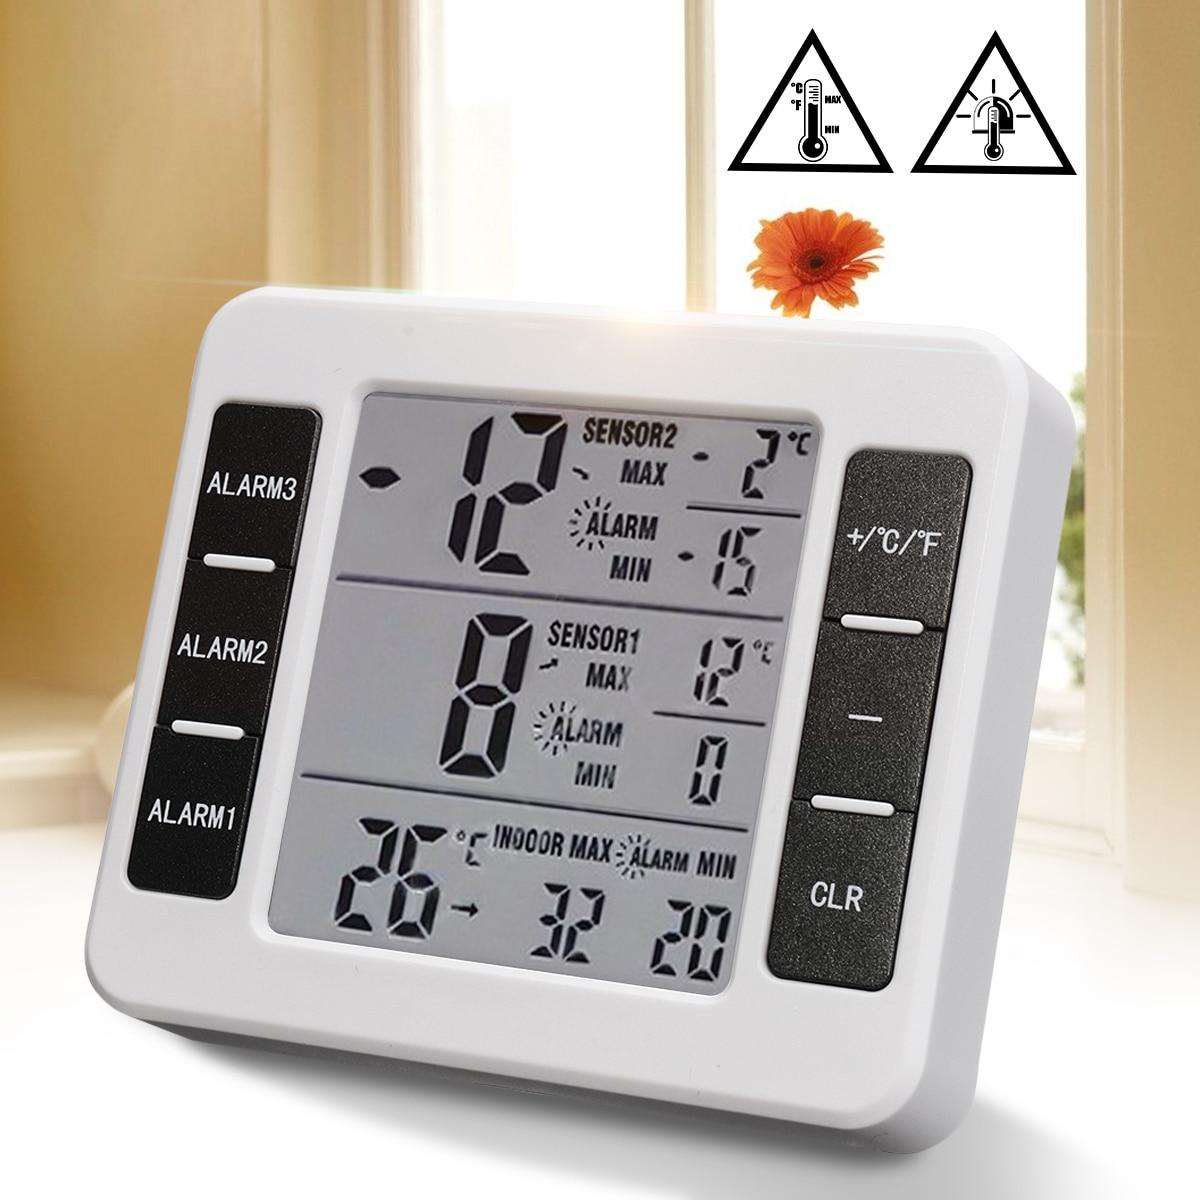 Mini Digital Thermometer Humidity Meter Room Temperature Indoor Lcd Thermohygrometer Hygrometer Htc 1 Ruangan Wireless Sensor Remote Control Max Min Recorder Alarm Display Universal